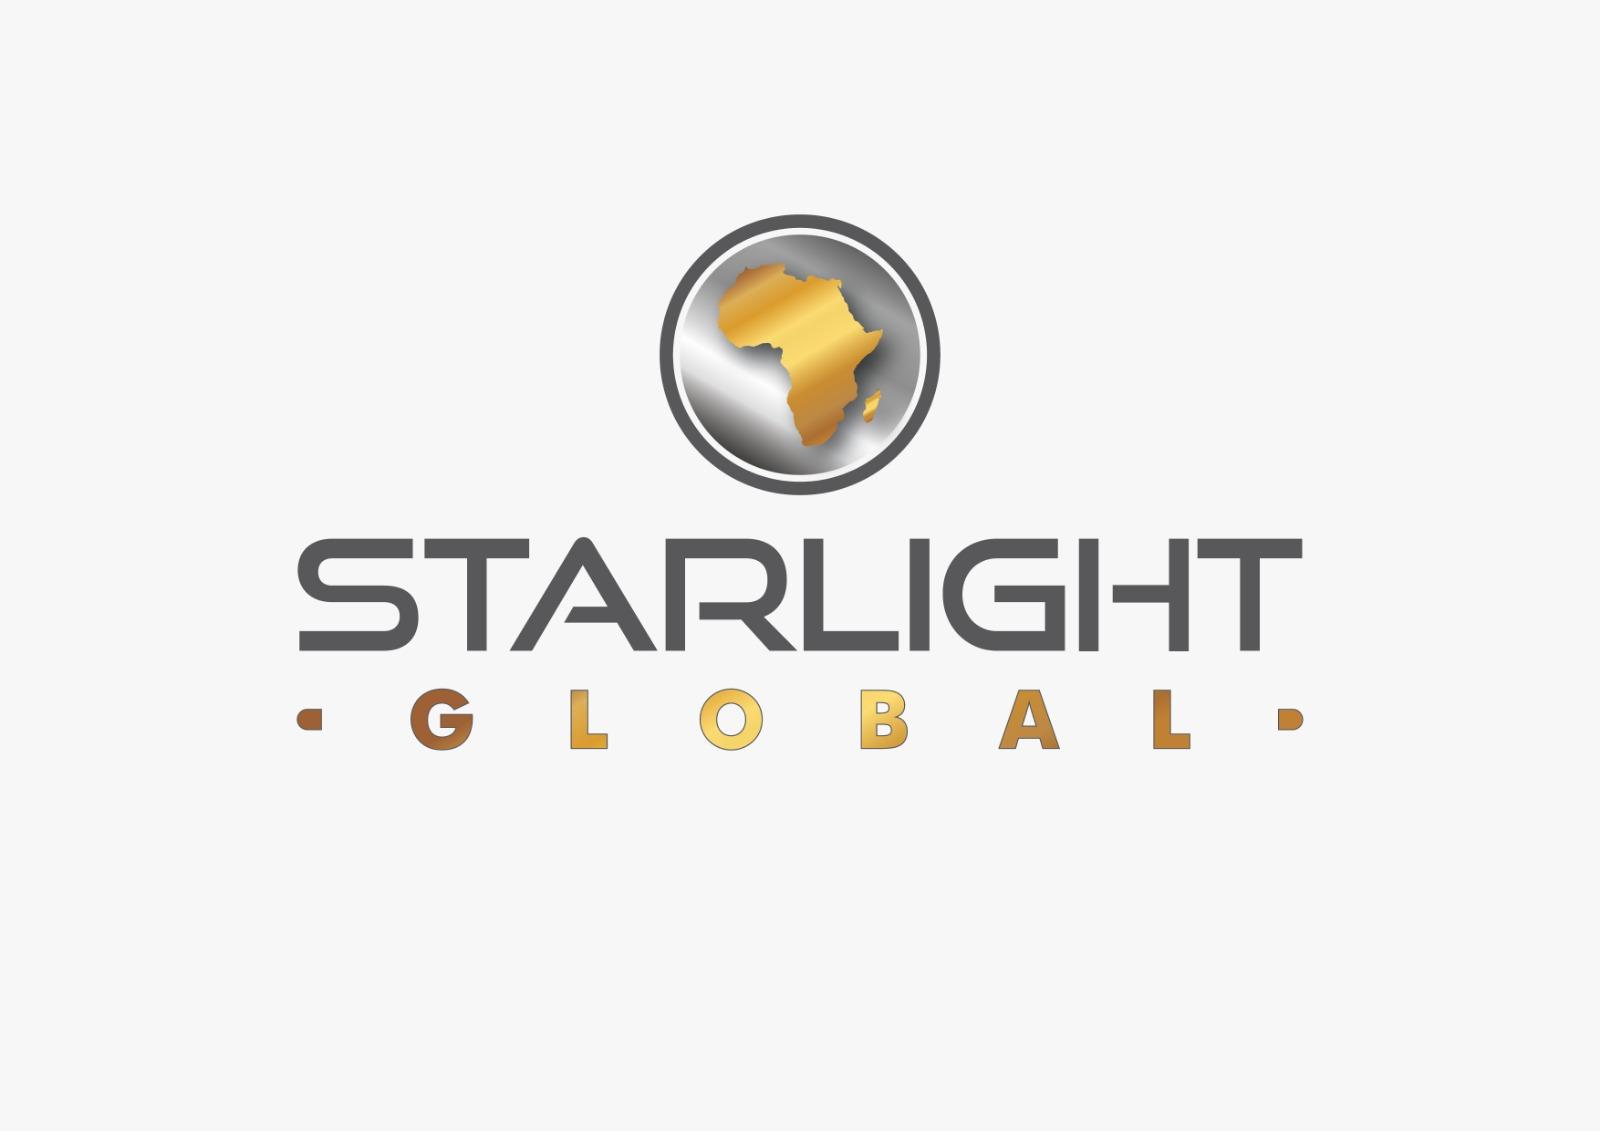 Starlight Global